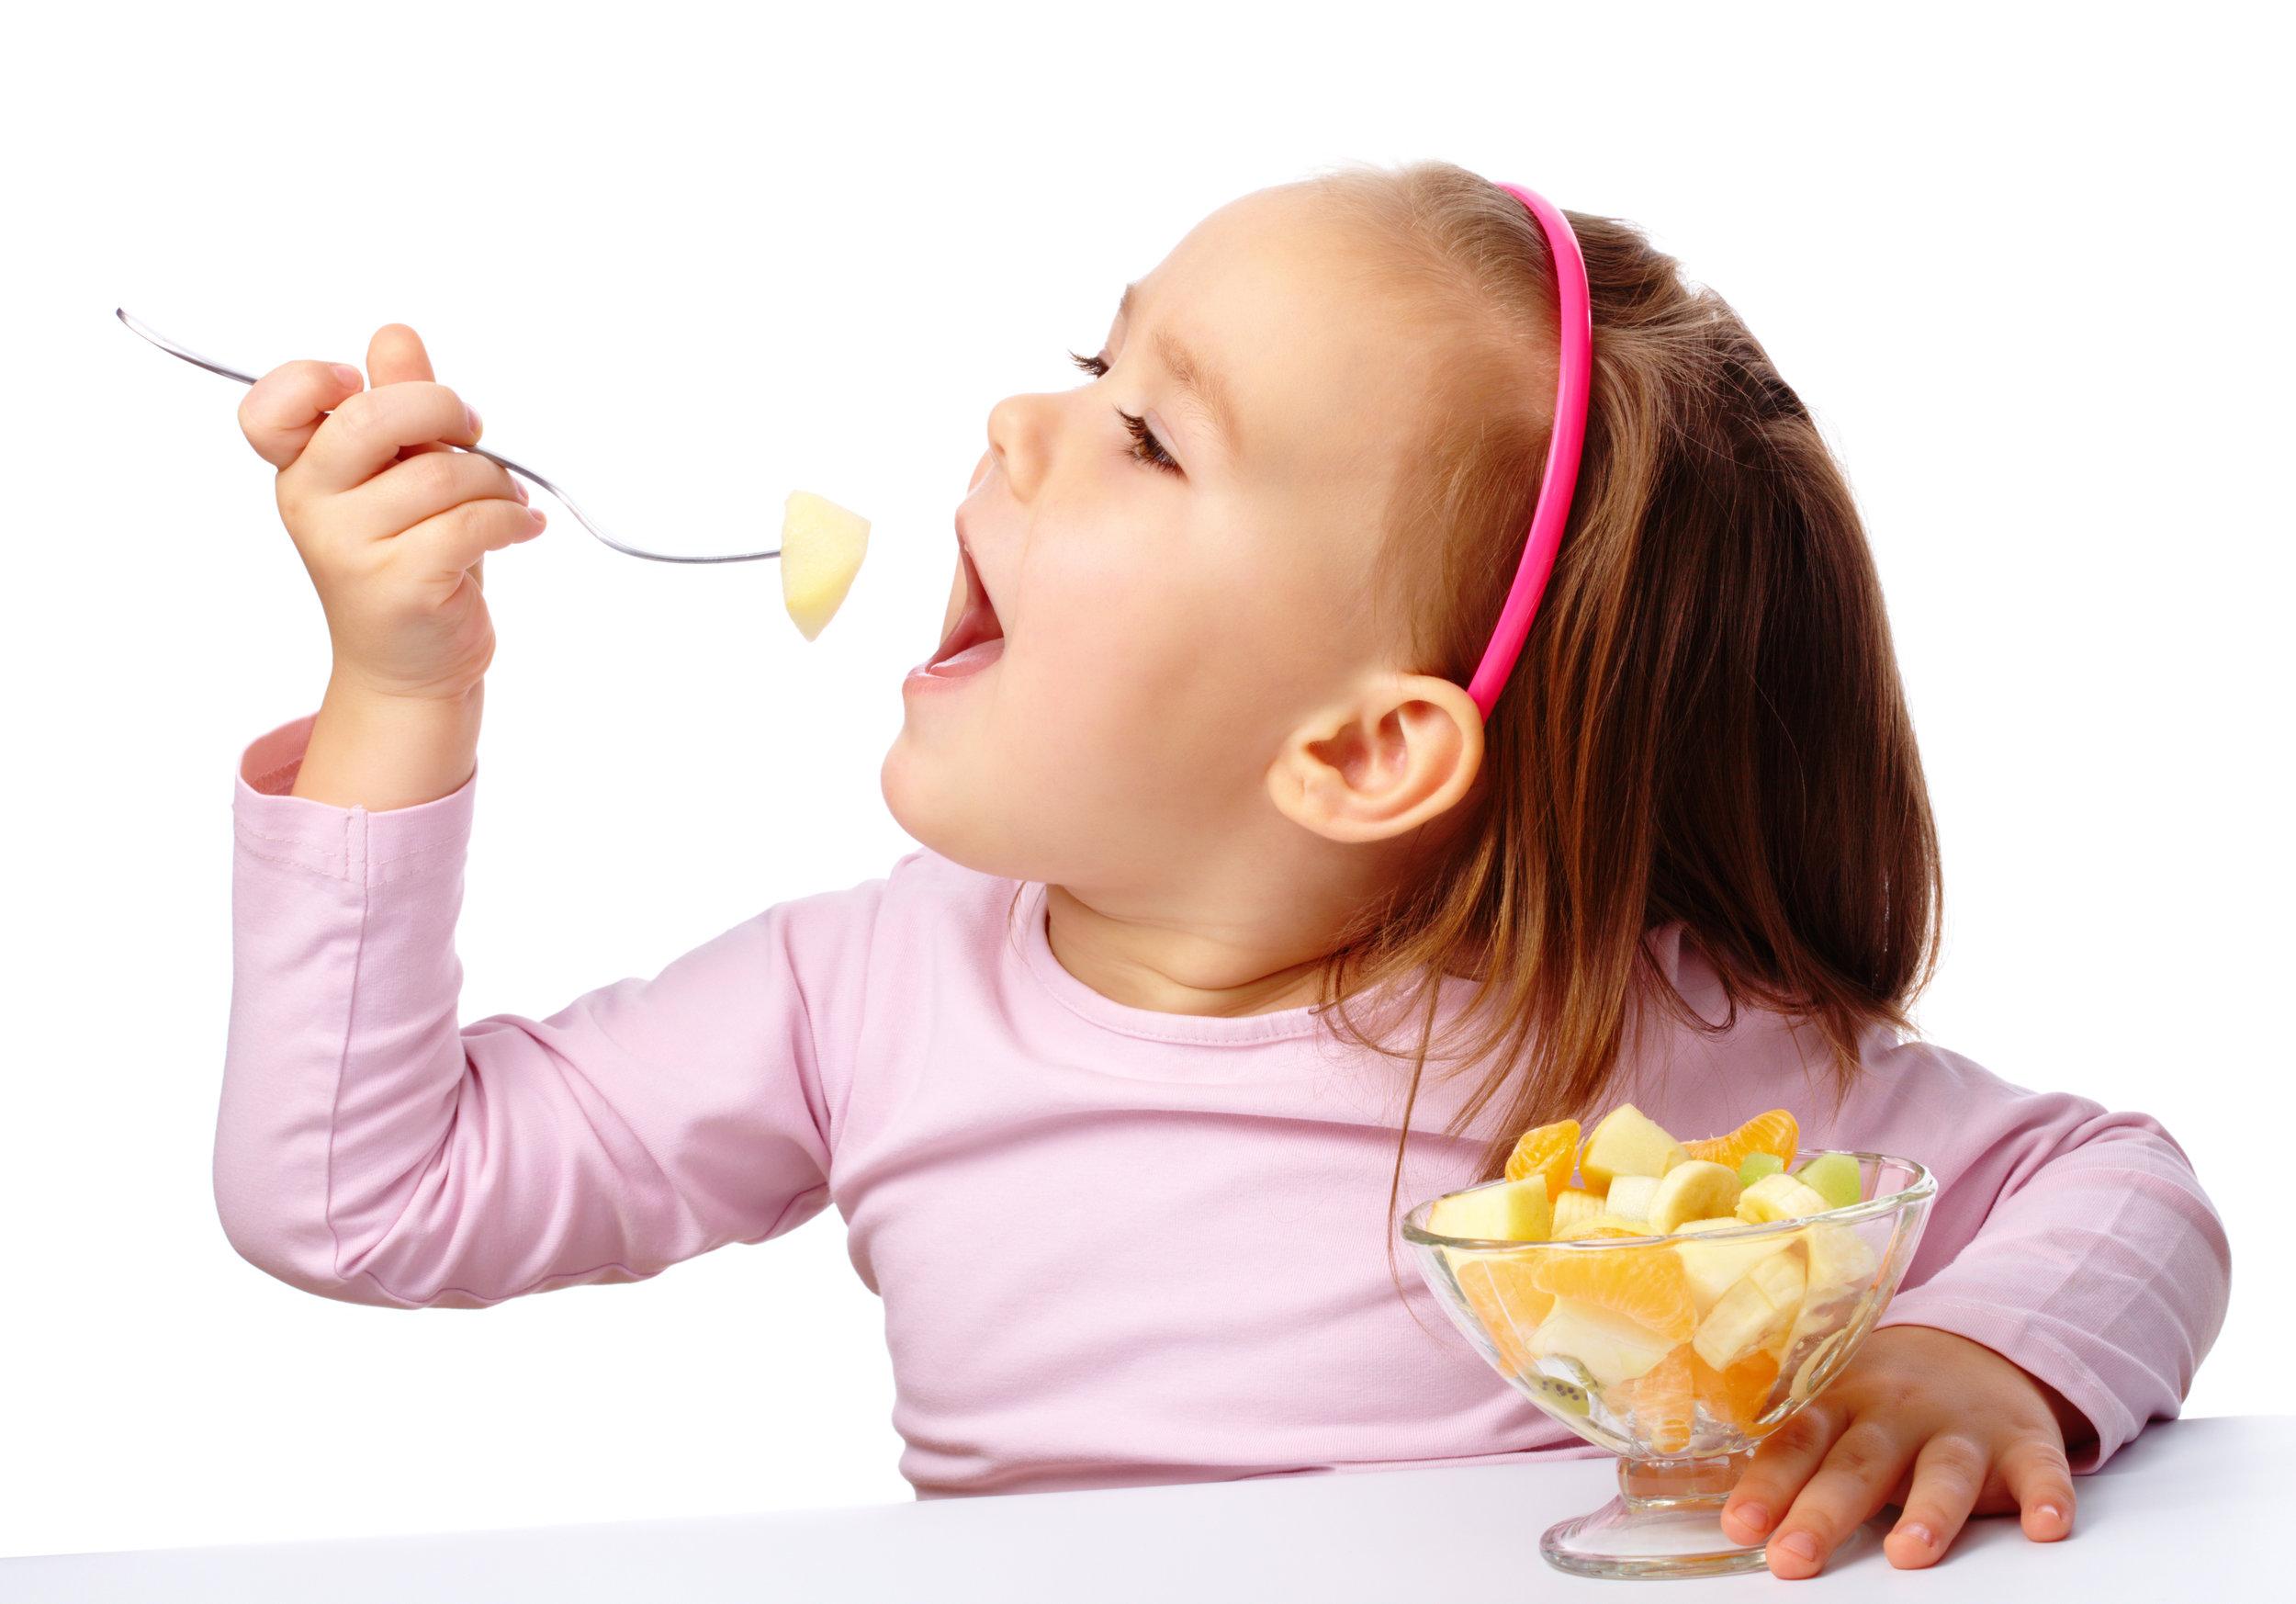 young girl eating fruit.jpg